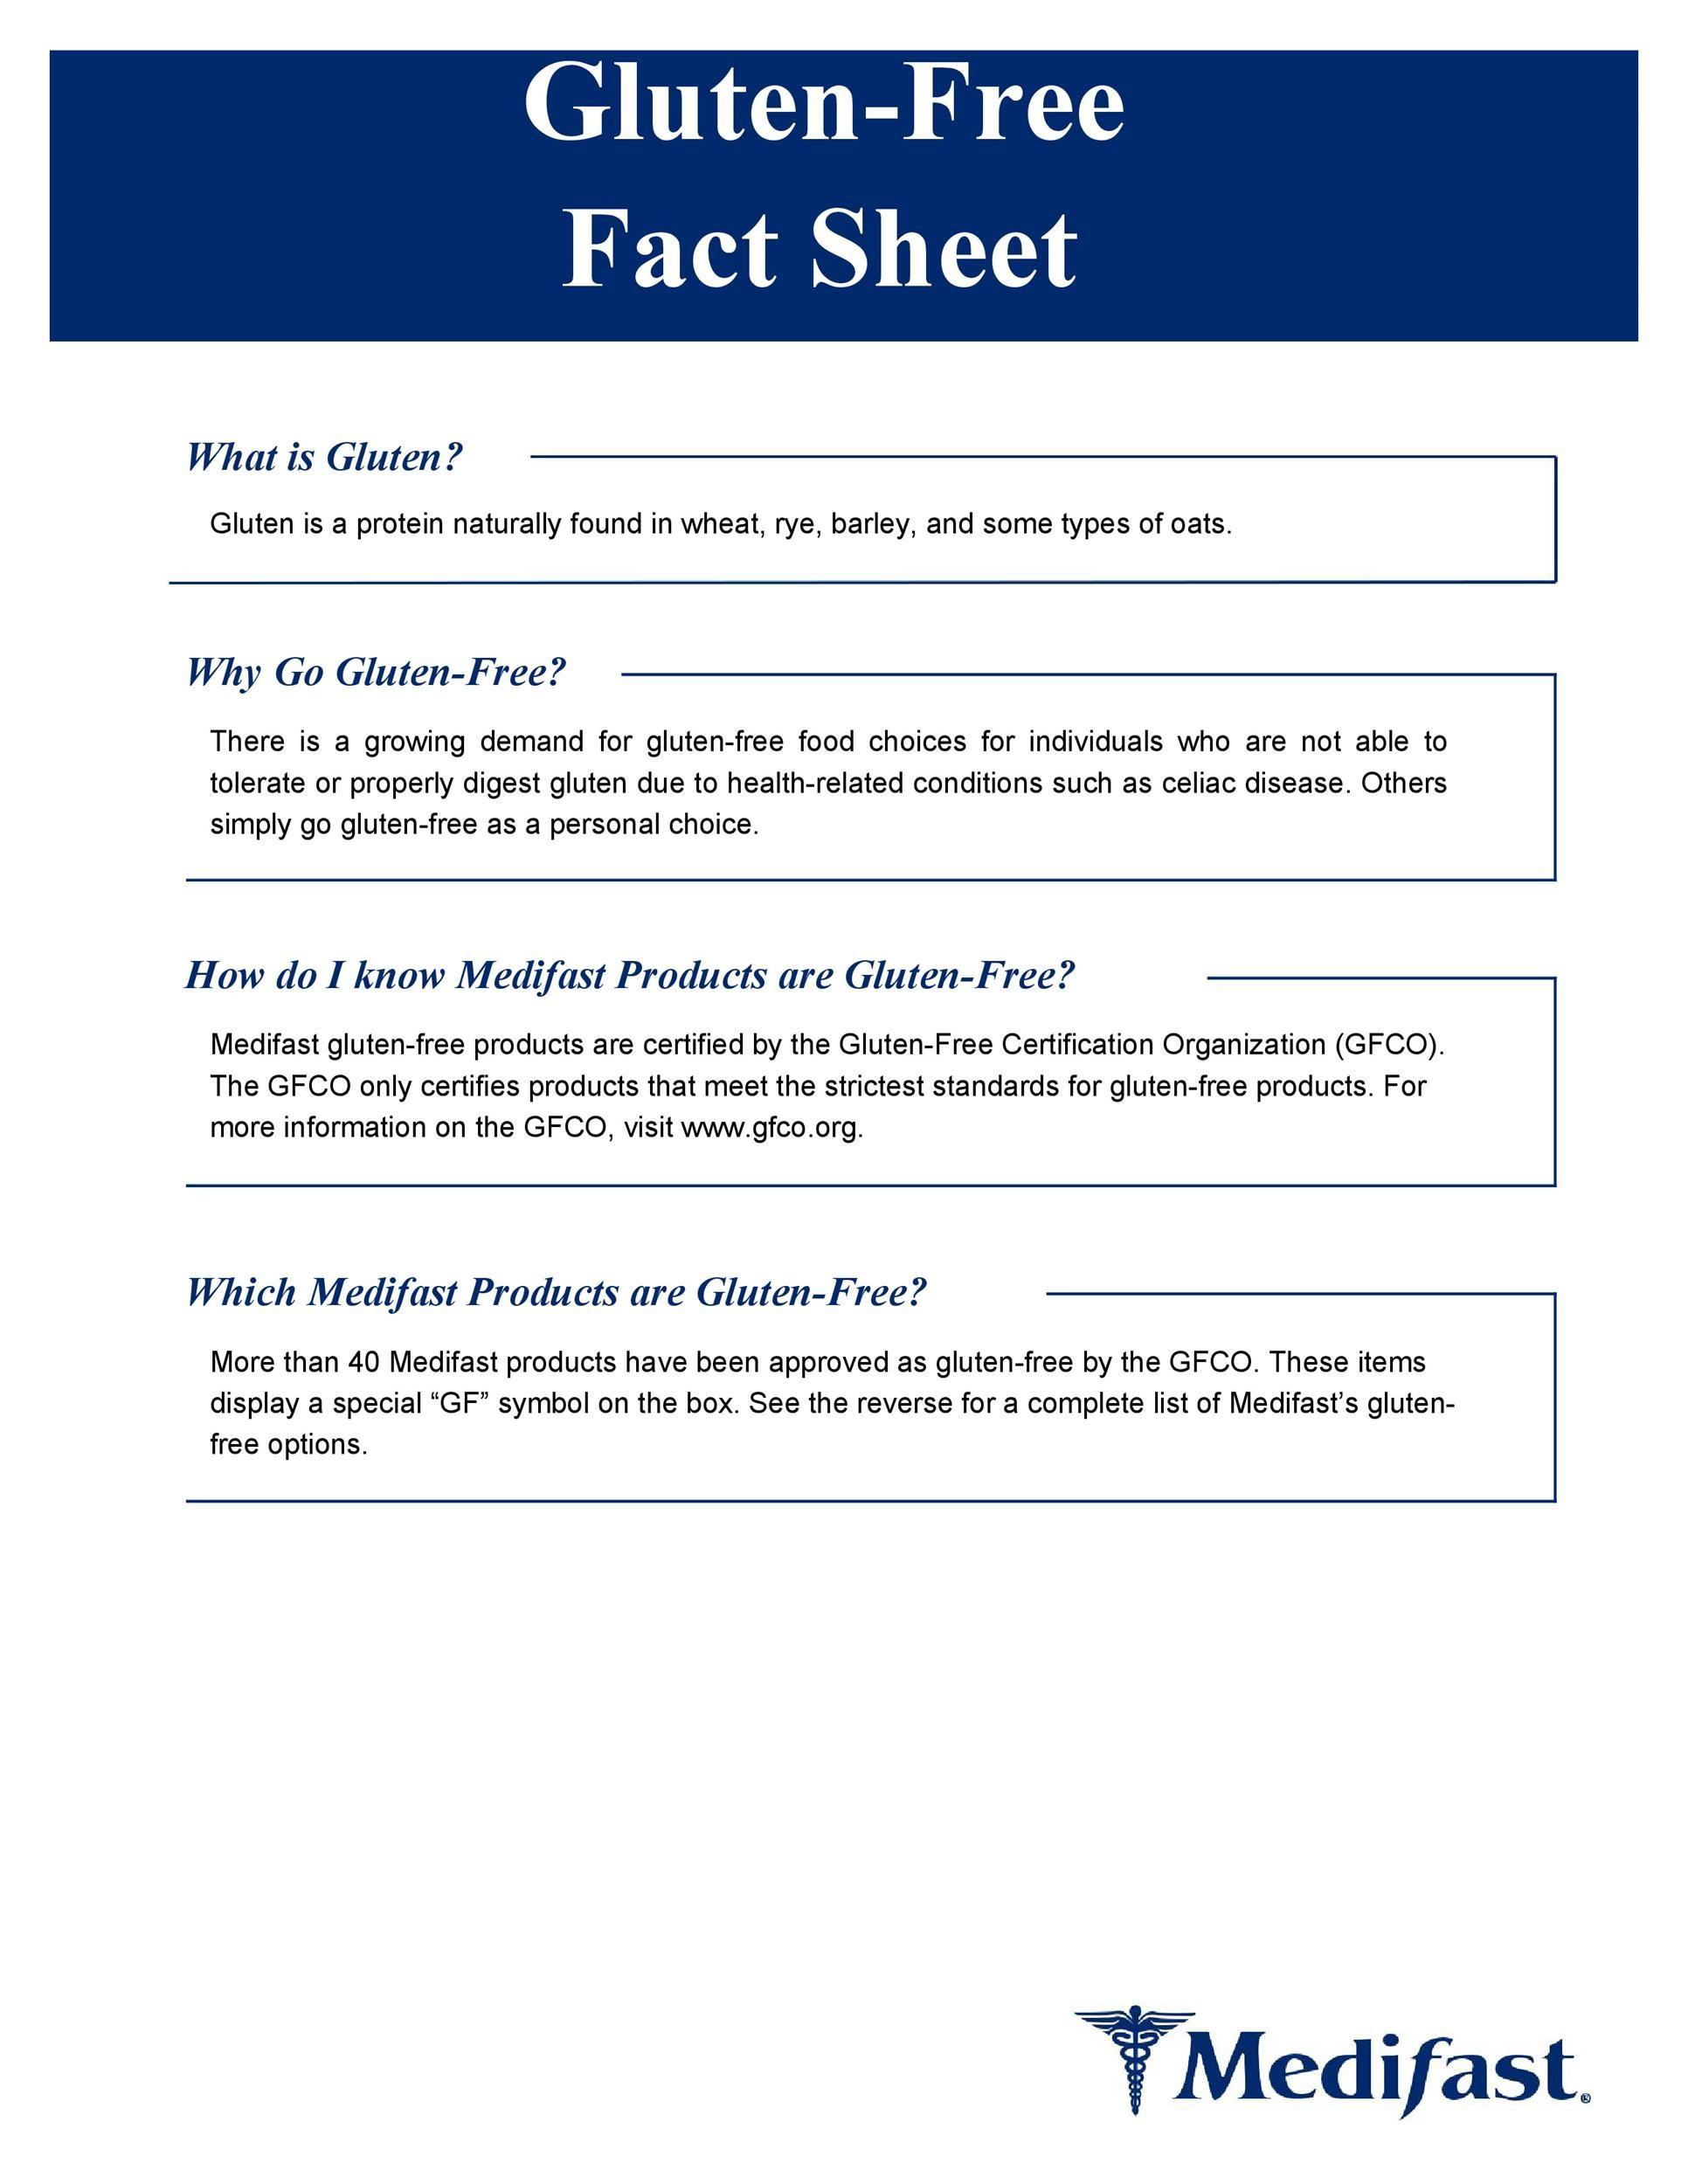 Personal Fact Sheet Template - Eliolera.com